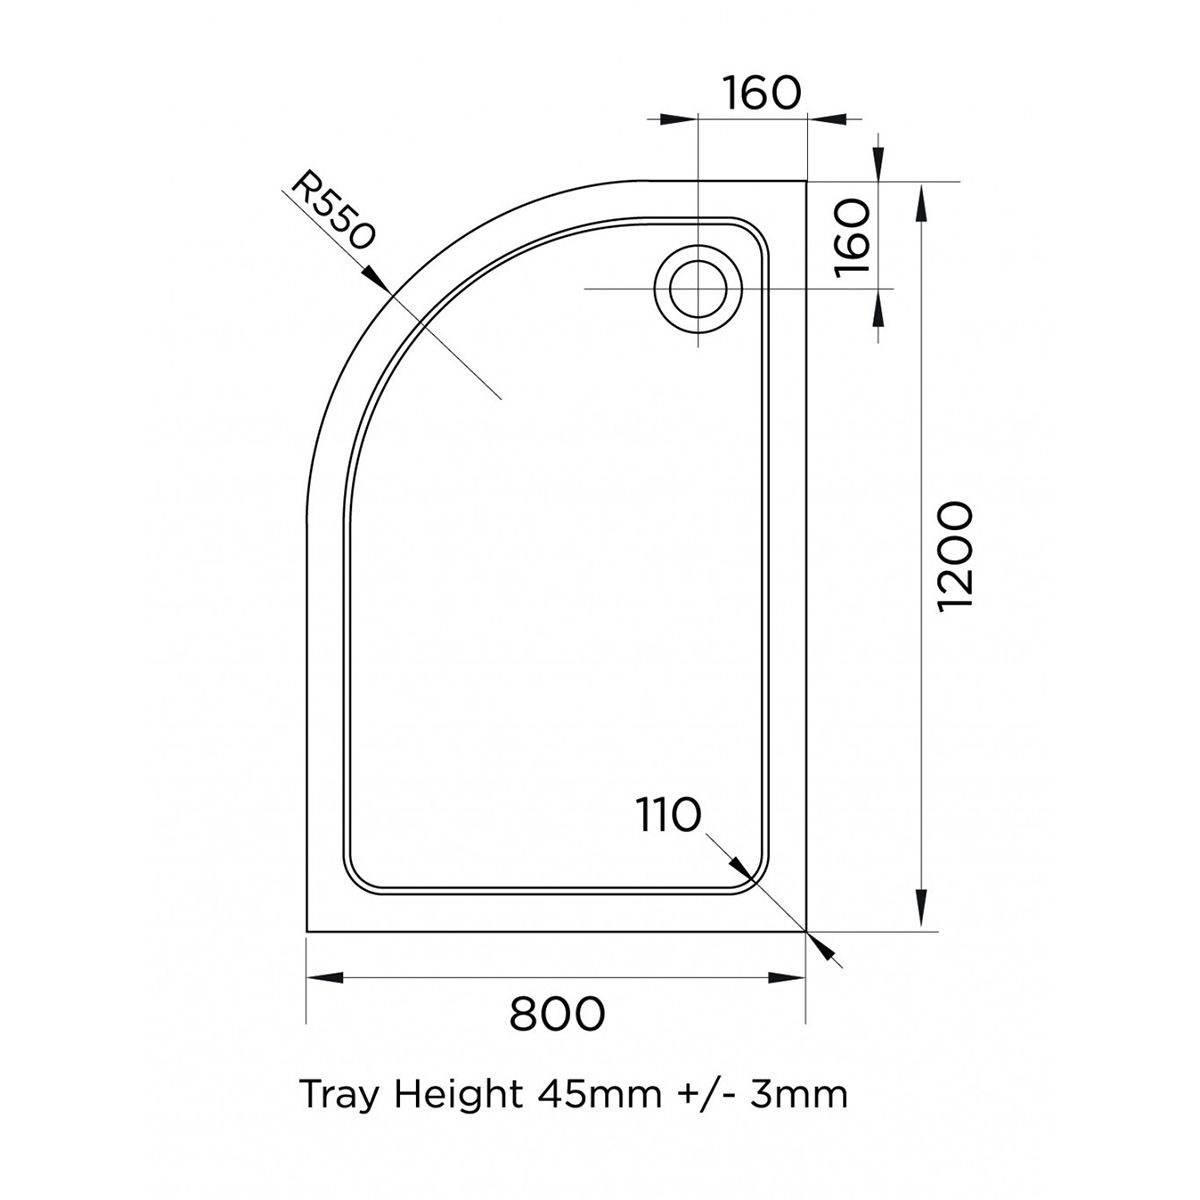 Aquadart Offset Quadrant 1200 x 800 Shower Tray Left Handed Line Drawing